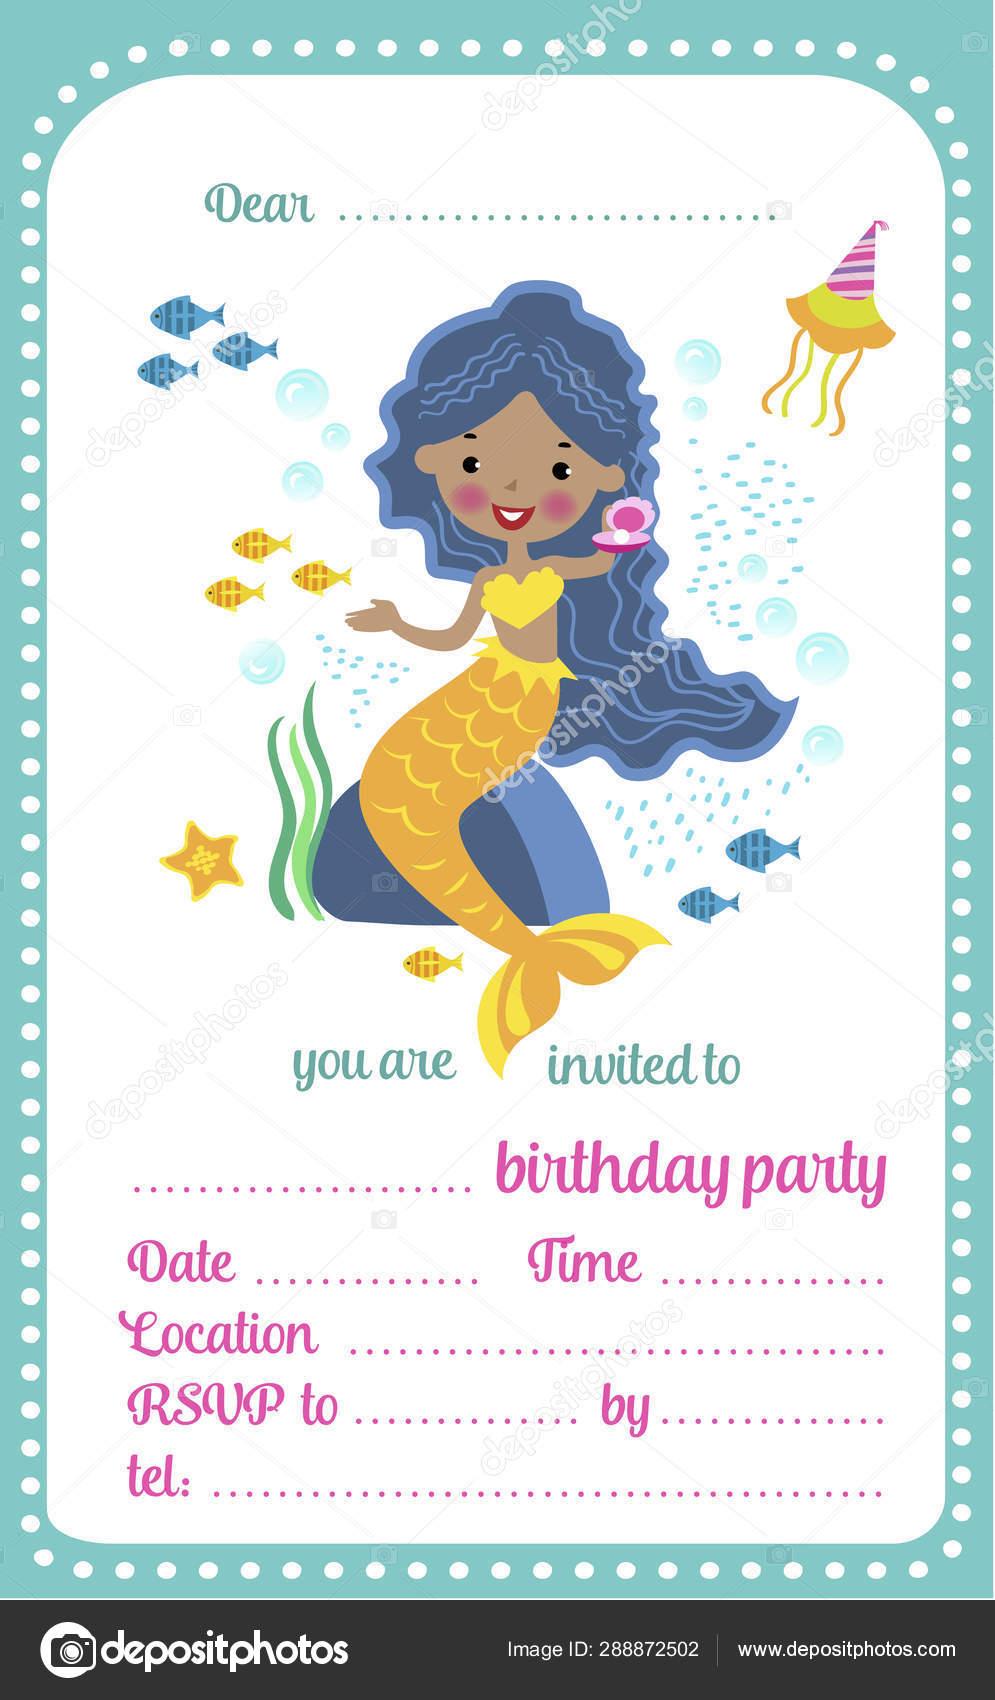 https depositphotos com 288872502 stock illustration kids birthday party invitation template html